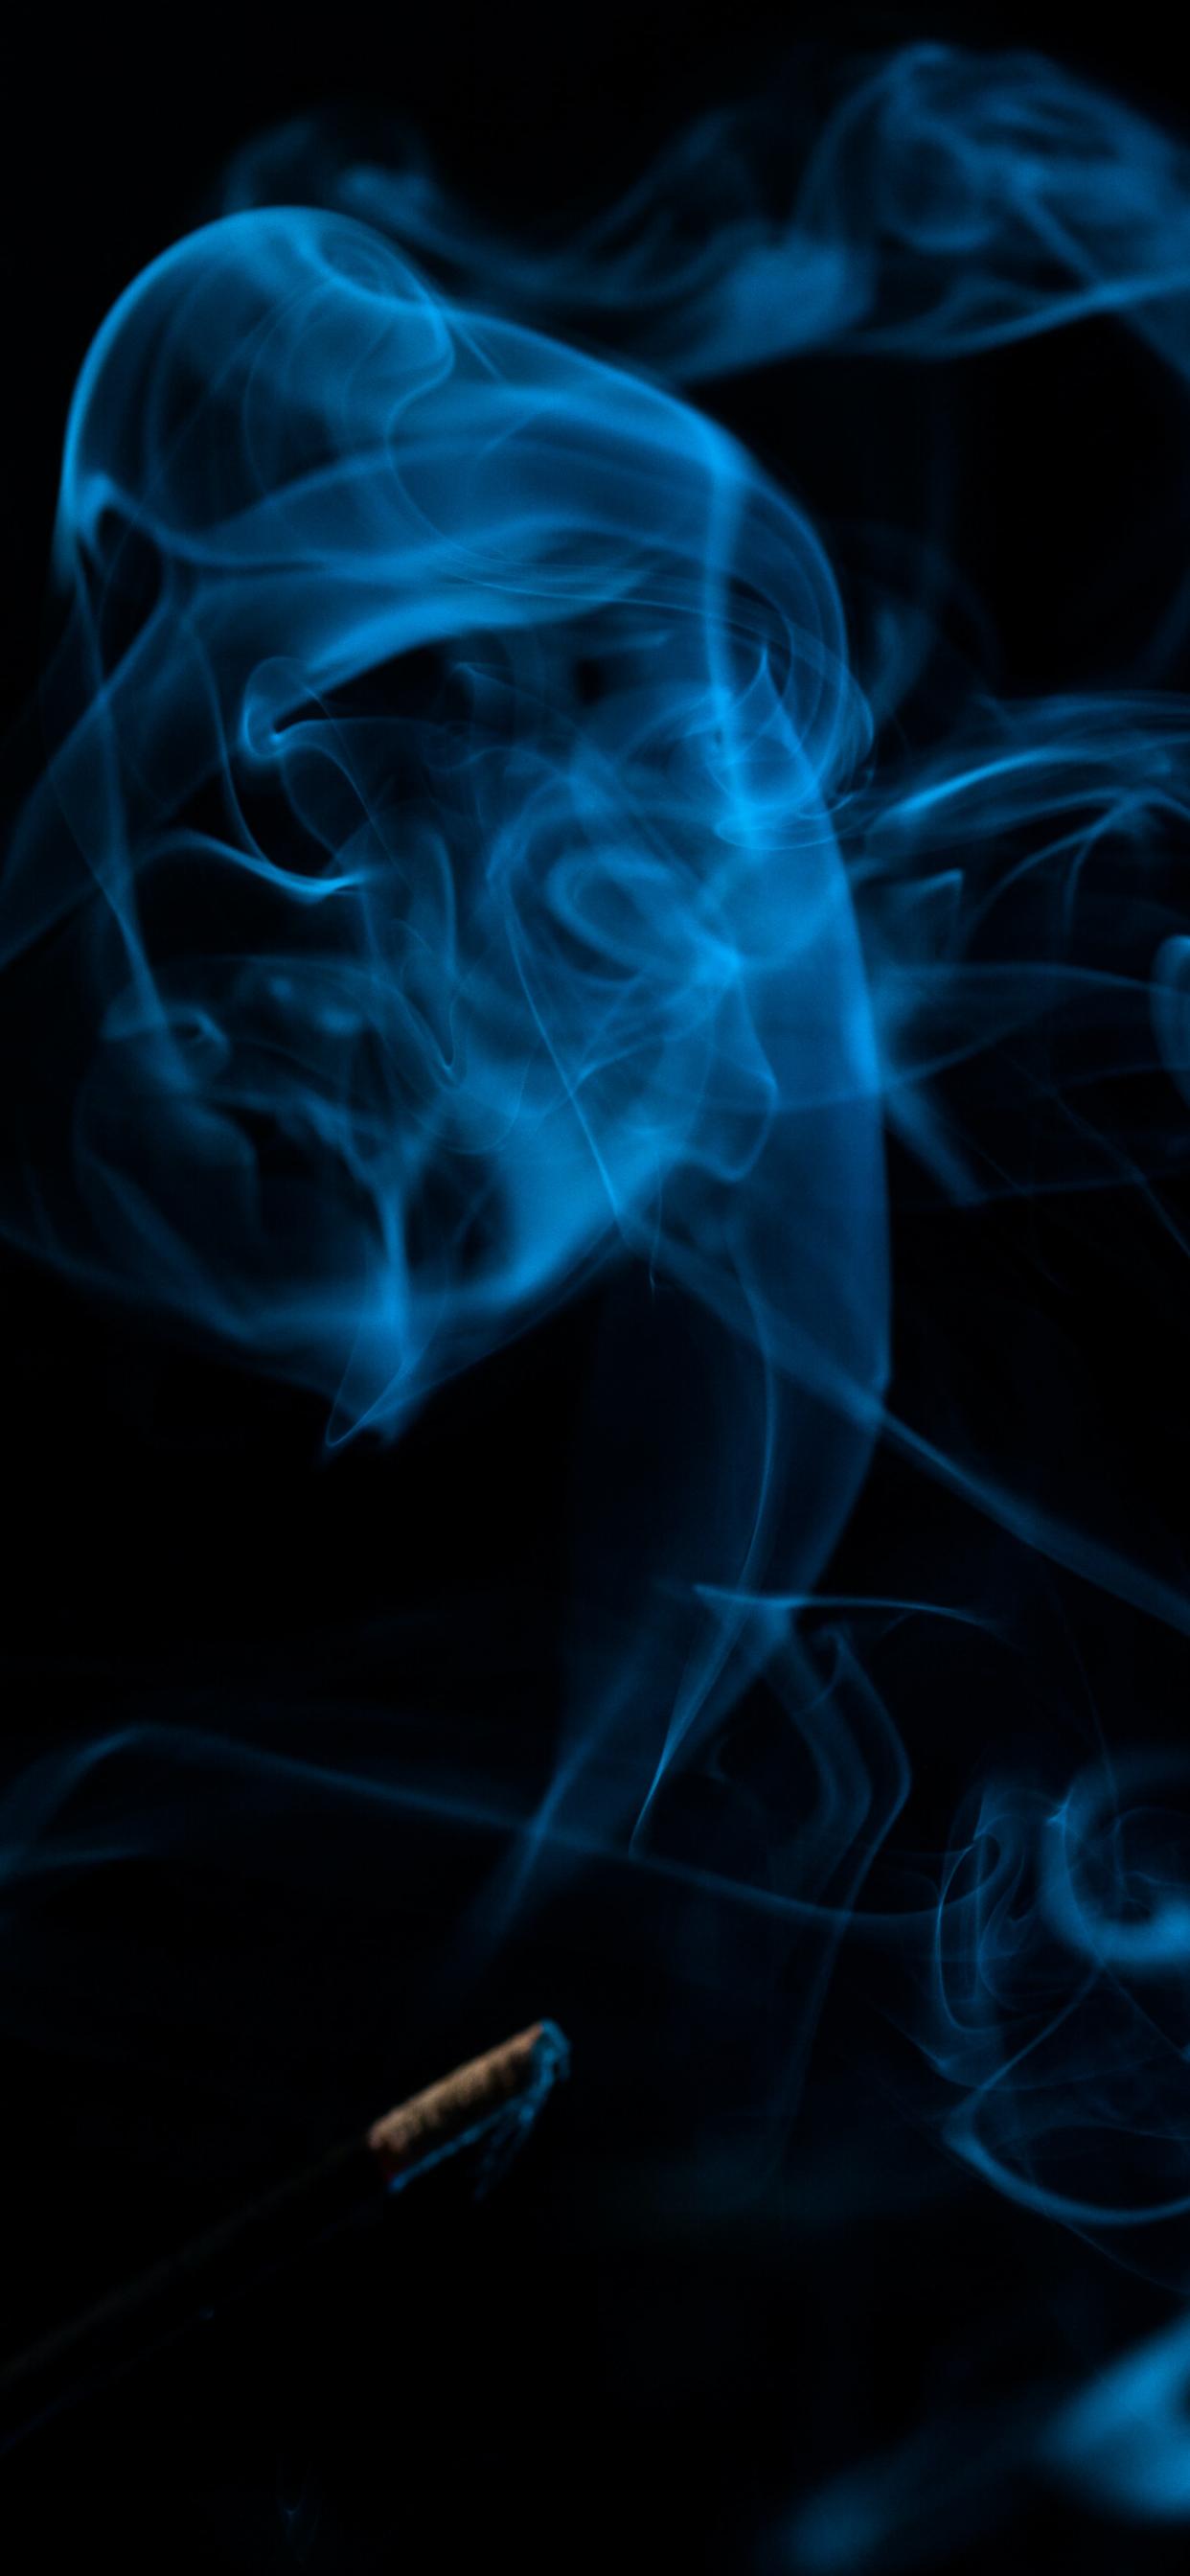 iPhone wallpapers smoke blue black Fonds d'écran iPhone du 08/05/2020